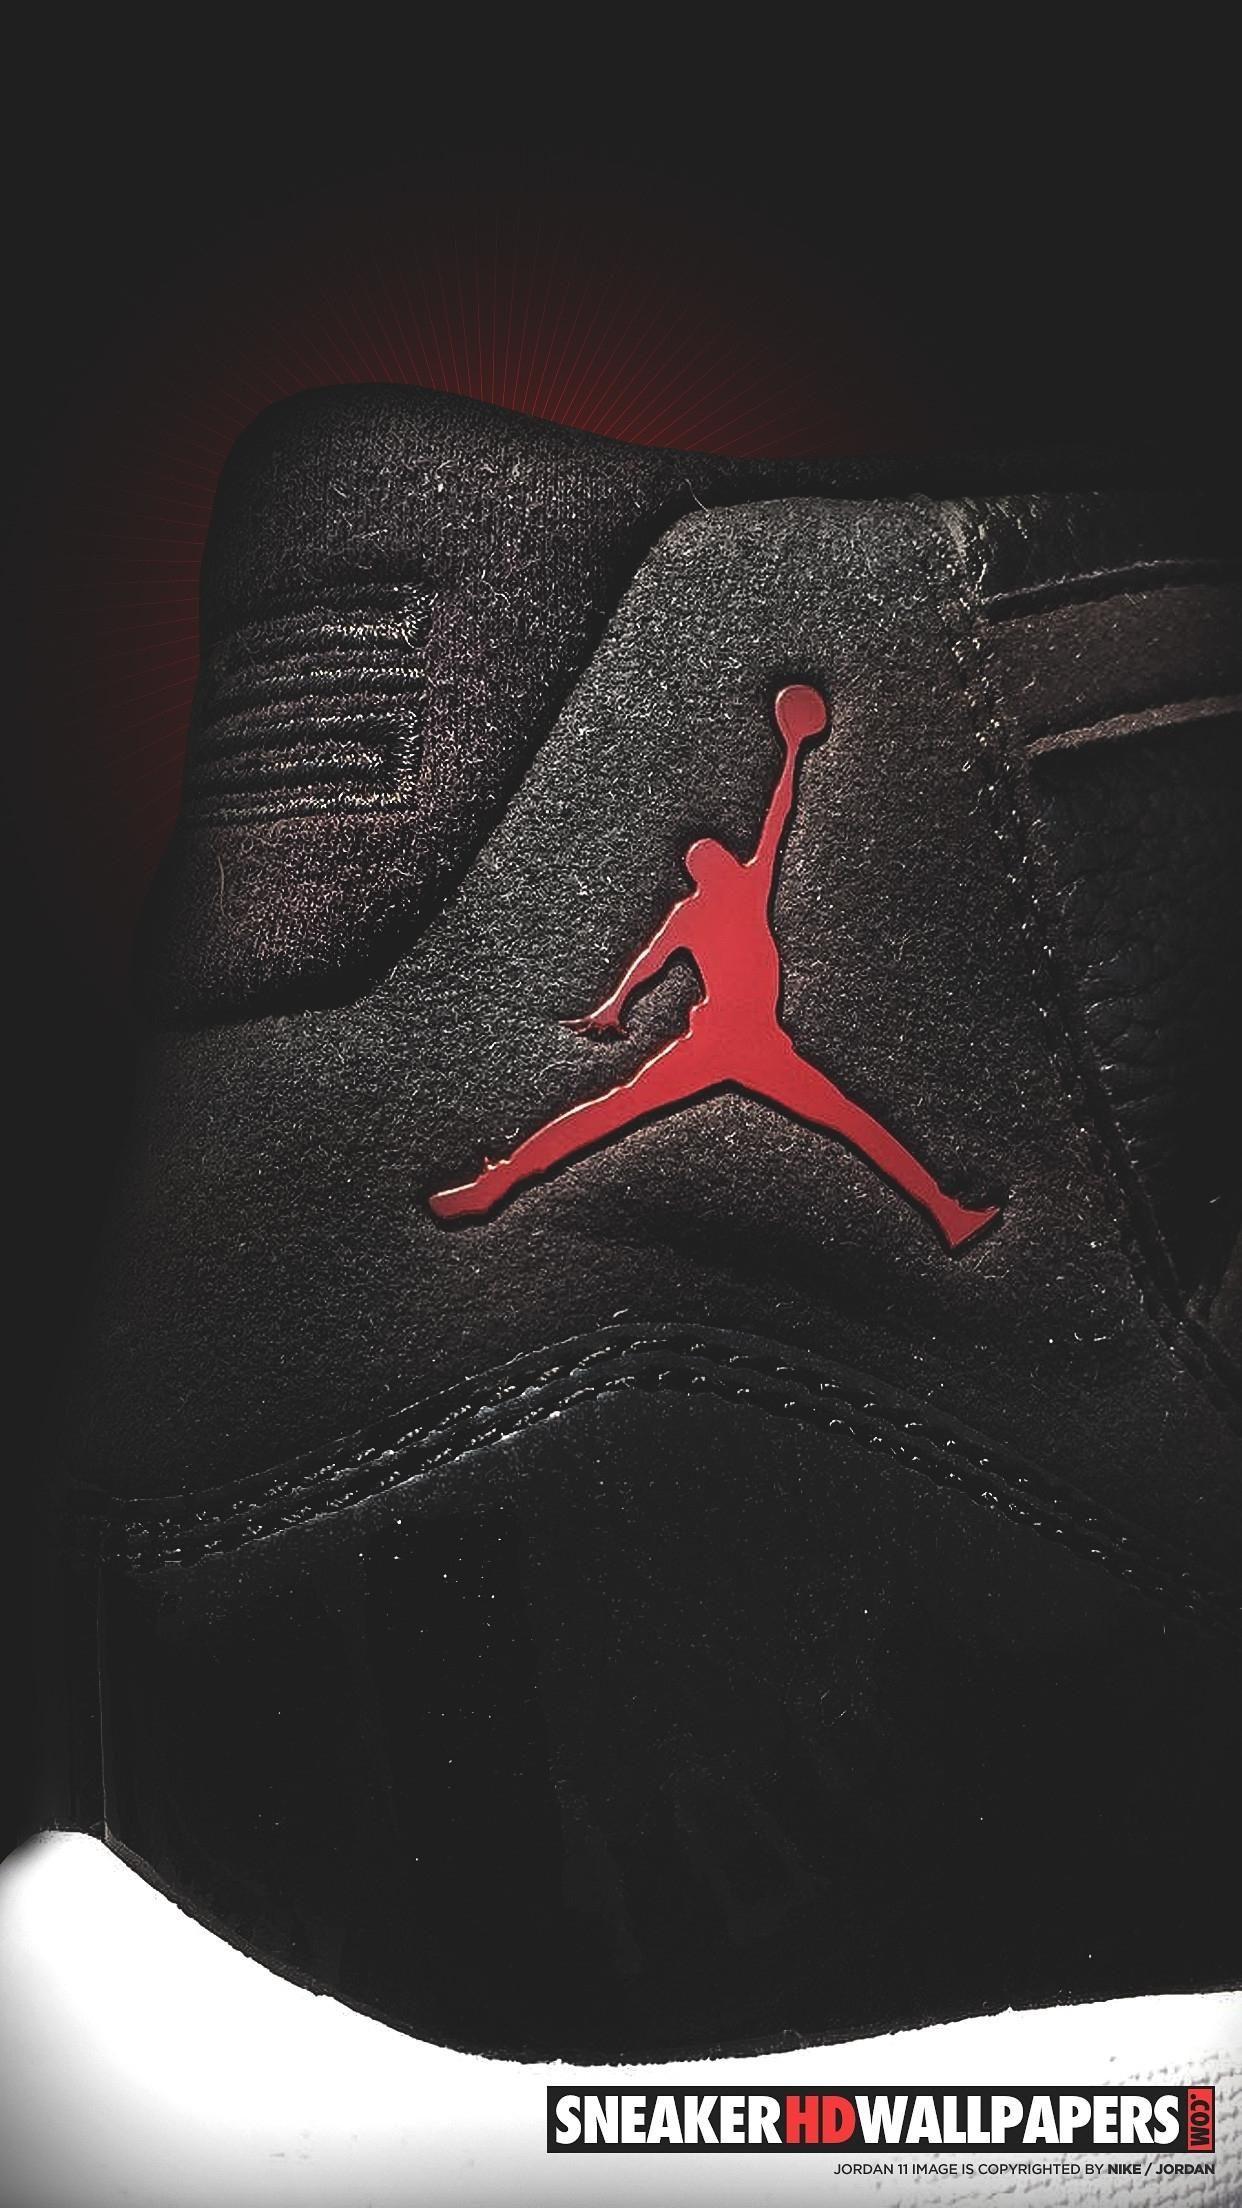 jordan logo wallpaper hd 787726 in 2020 Jordan logo